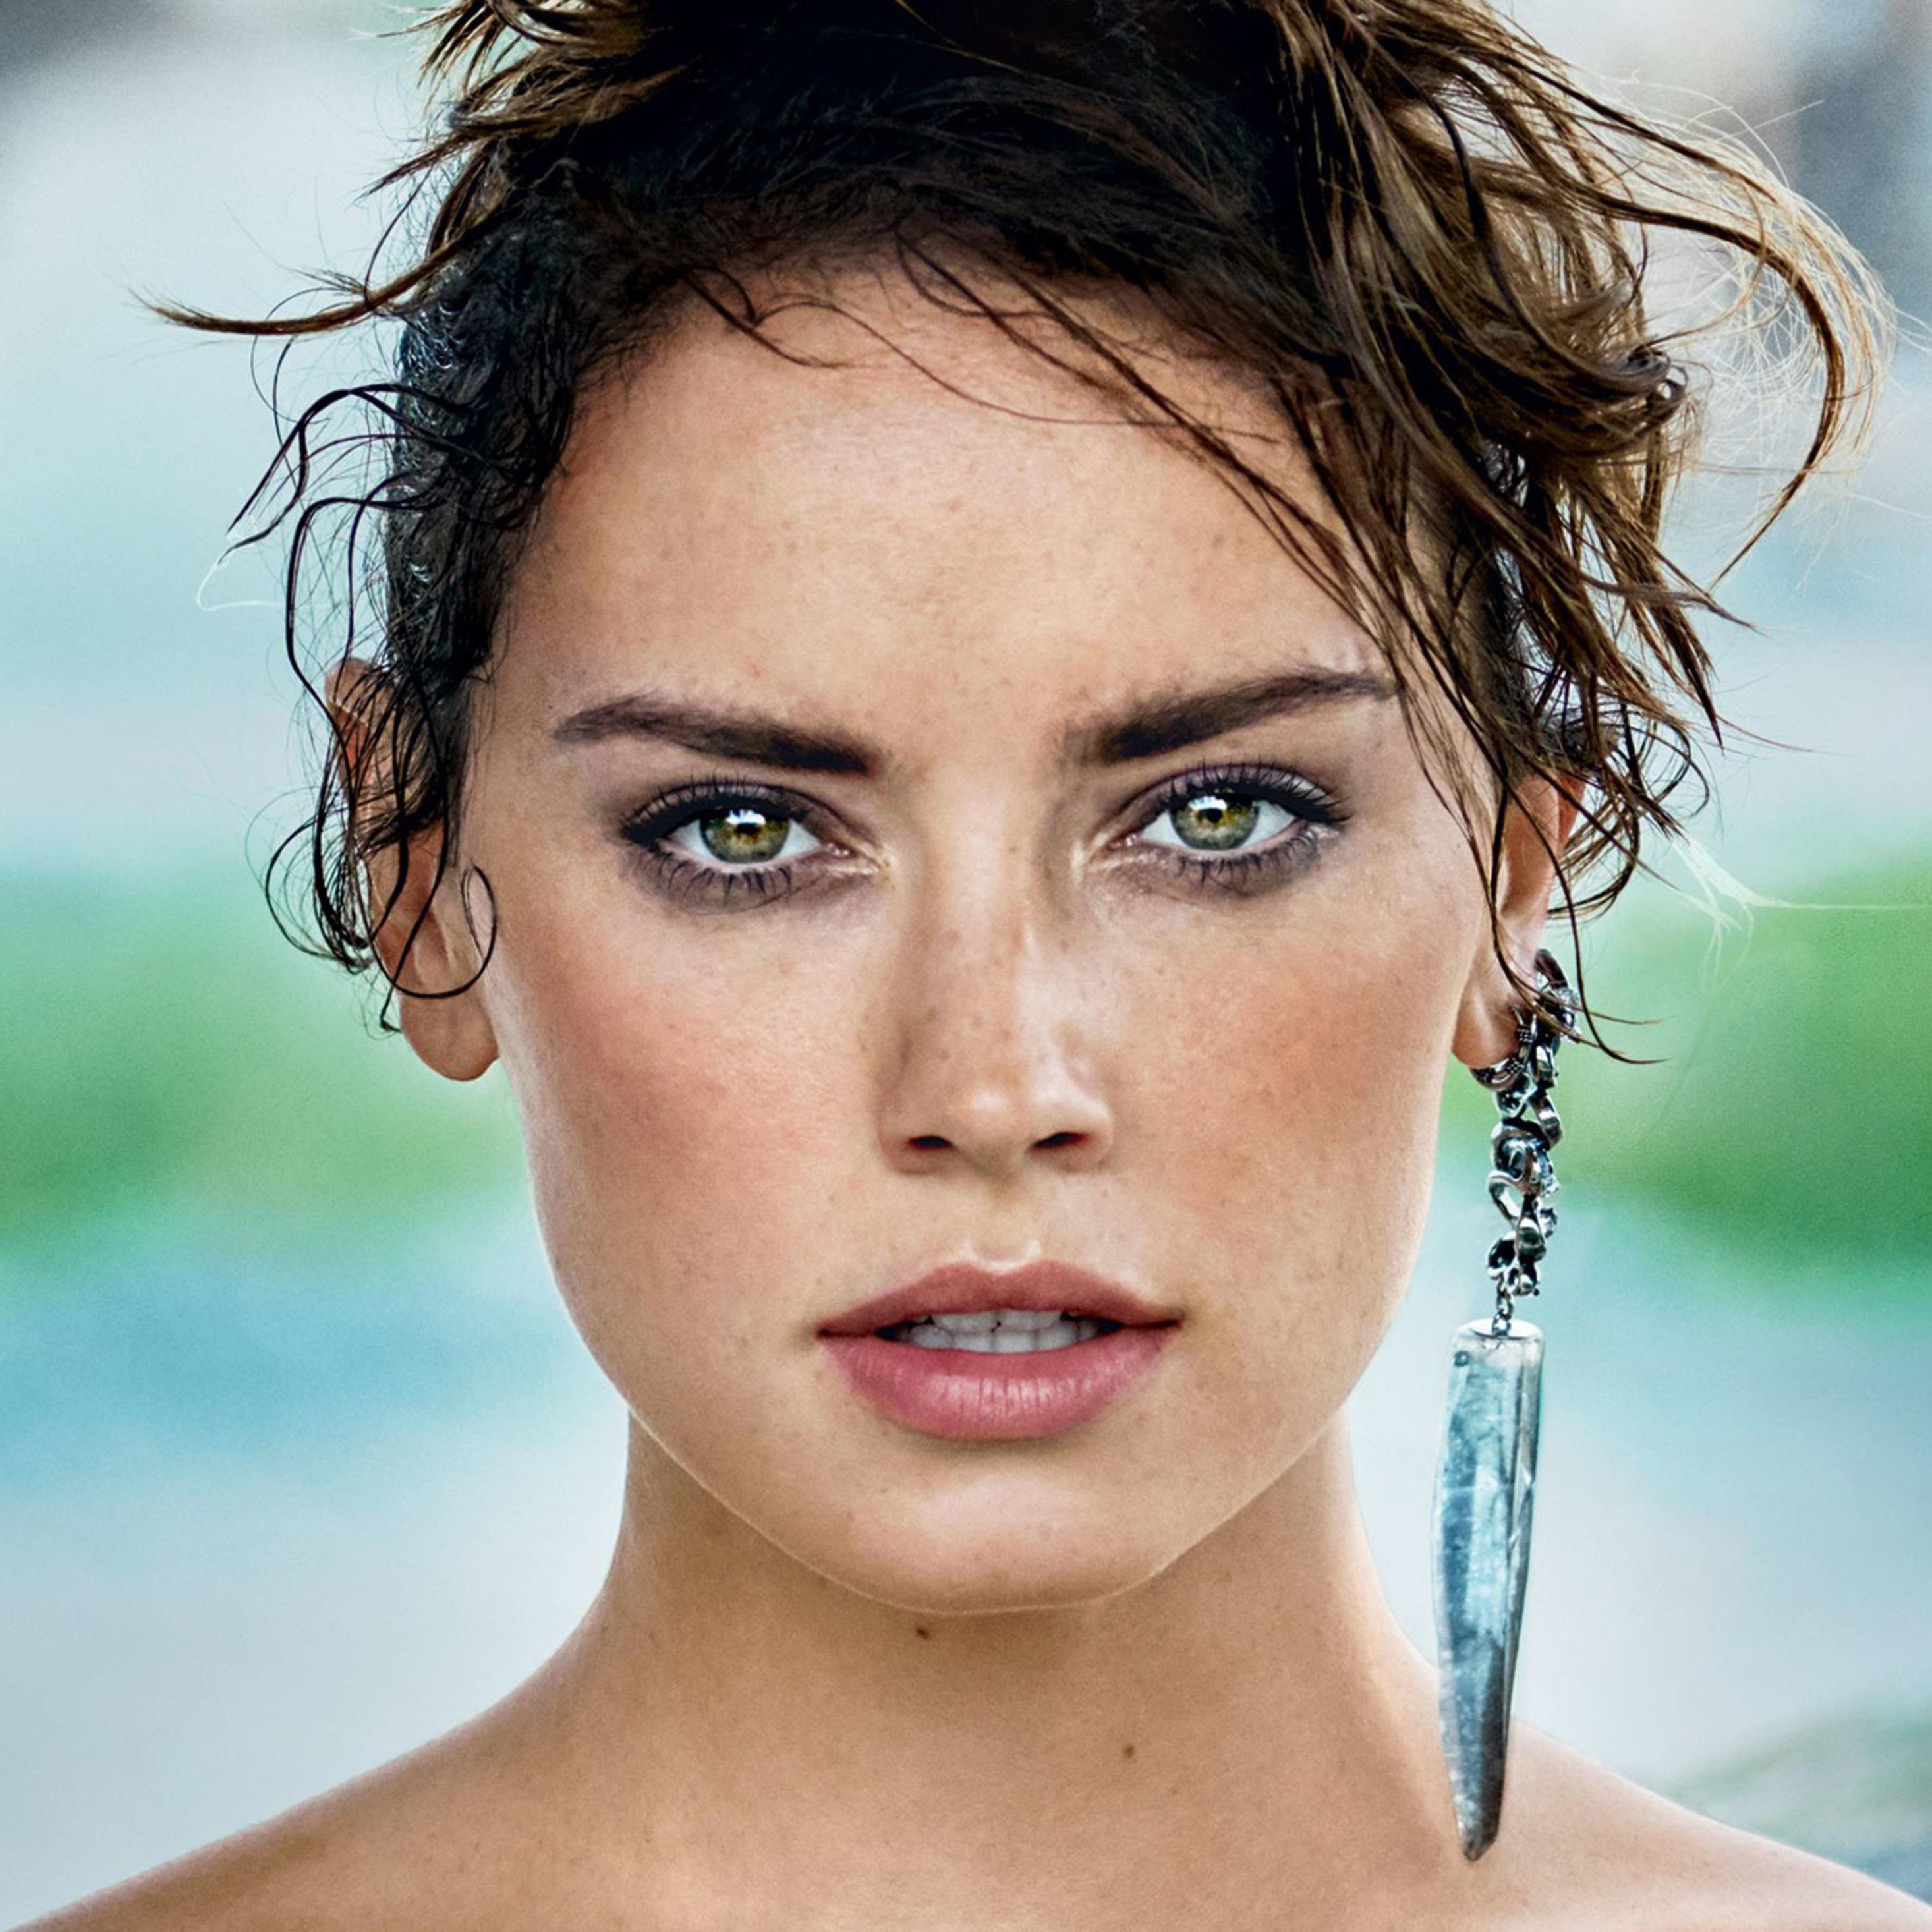 2932x2932 Daisy Ridley Vogue 2017 Photoshoot Ipad Pro